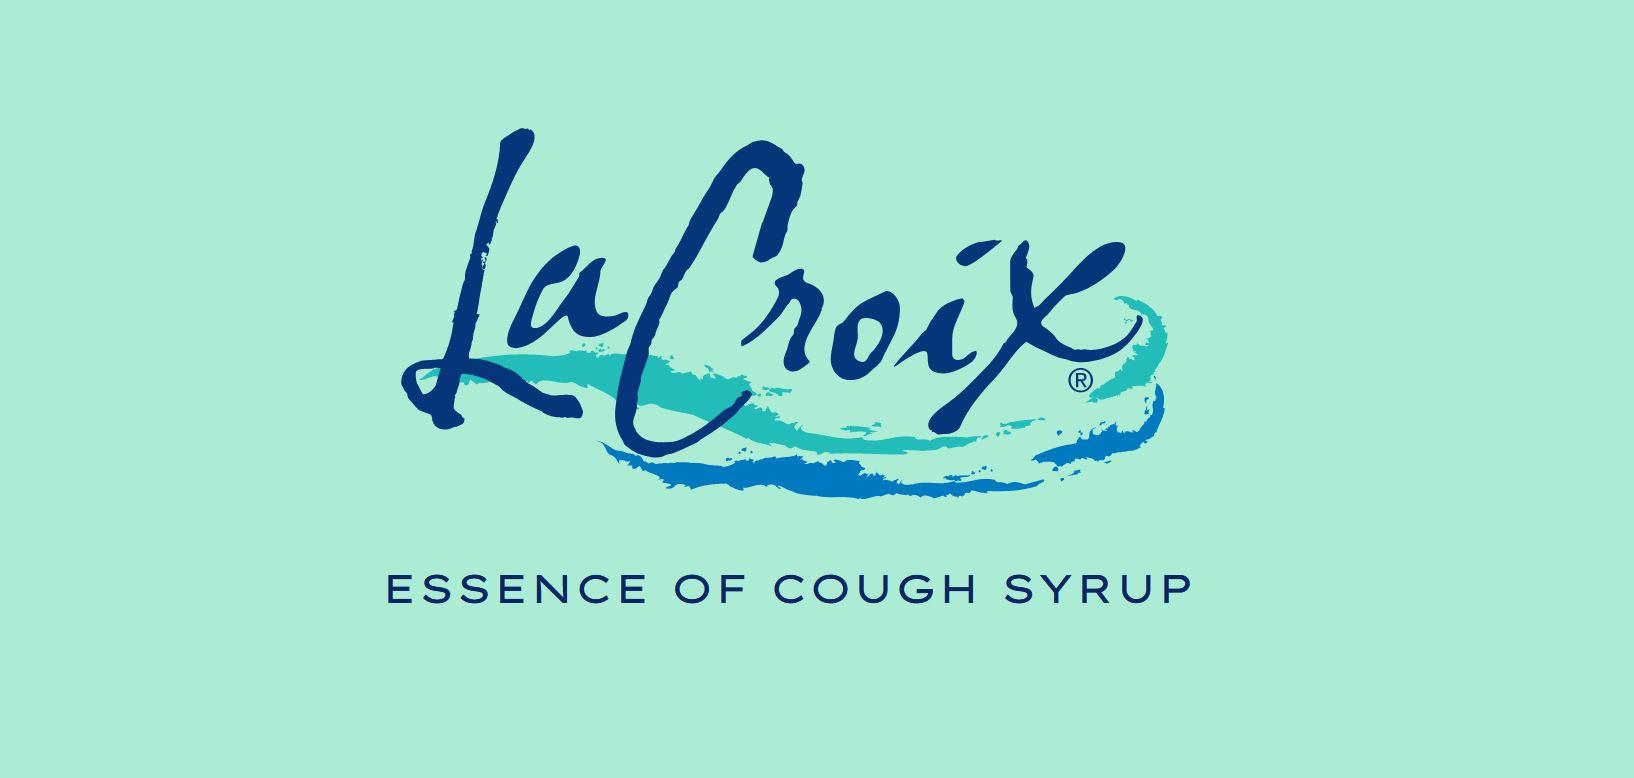 Lacroix flavor generator / Boing Boing